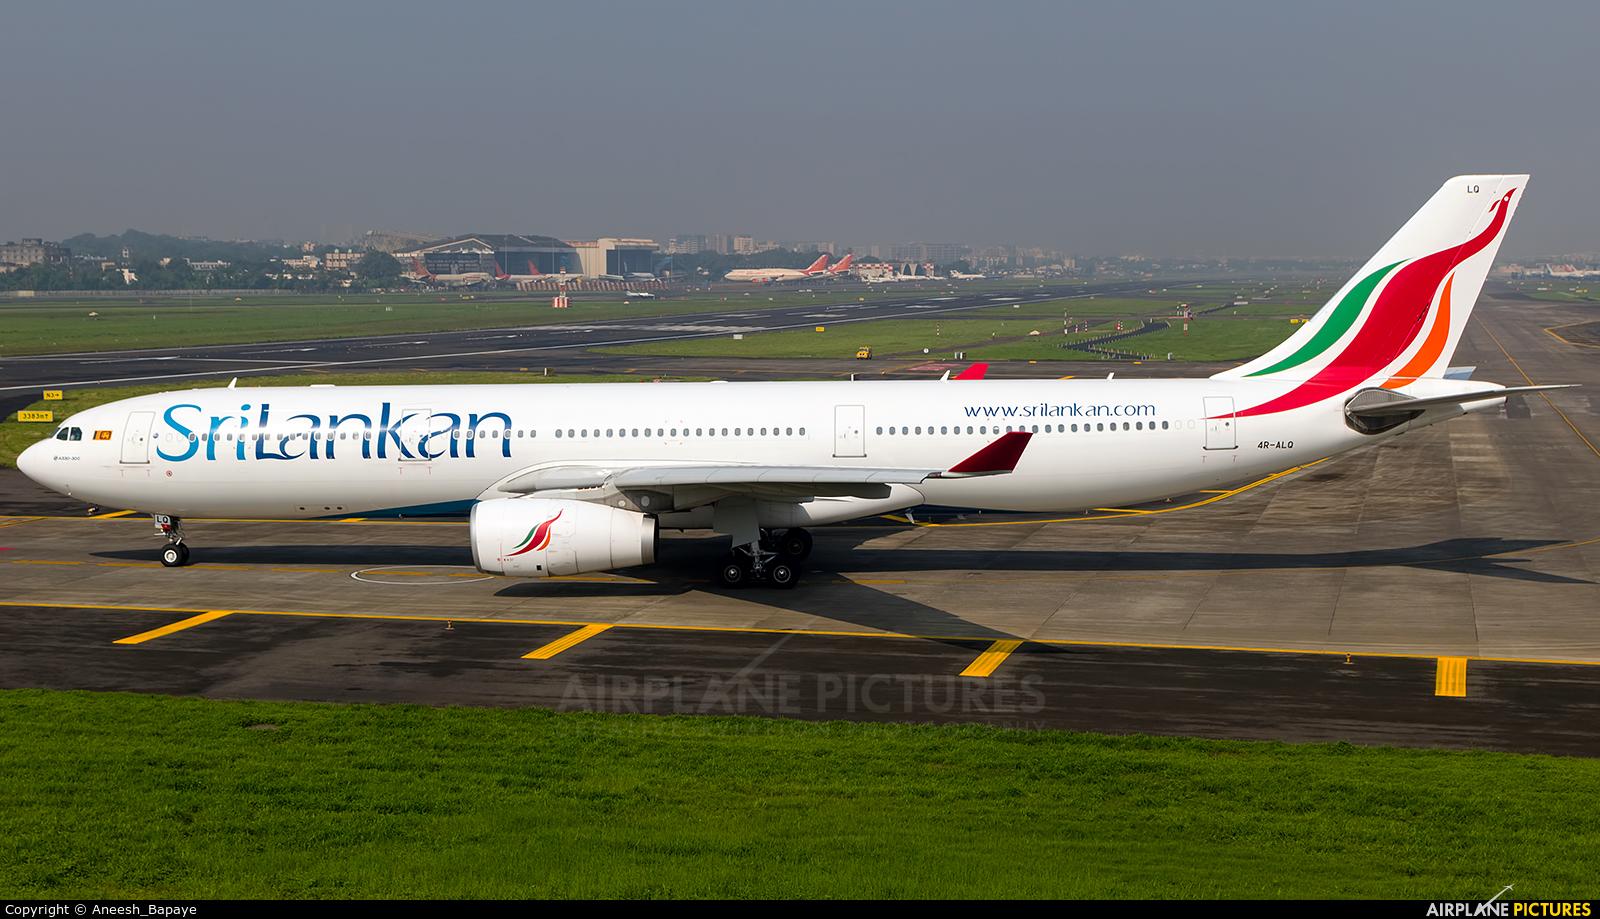 SriLankan Airlines 4R-ALQ aircraft at Mumbai - Chhatrapati Shivaji Intl